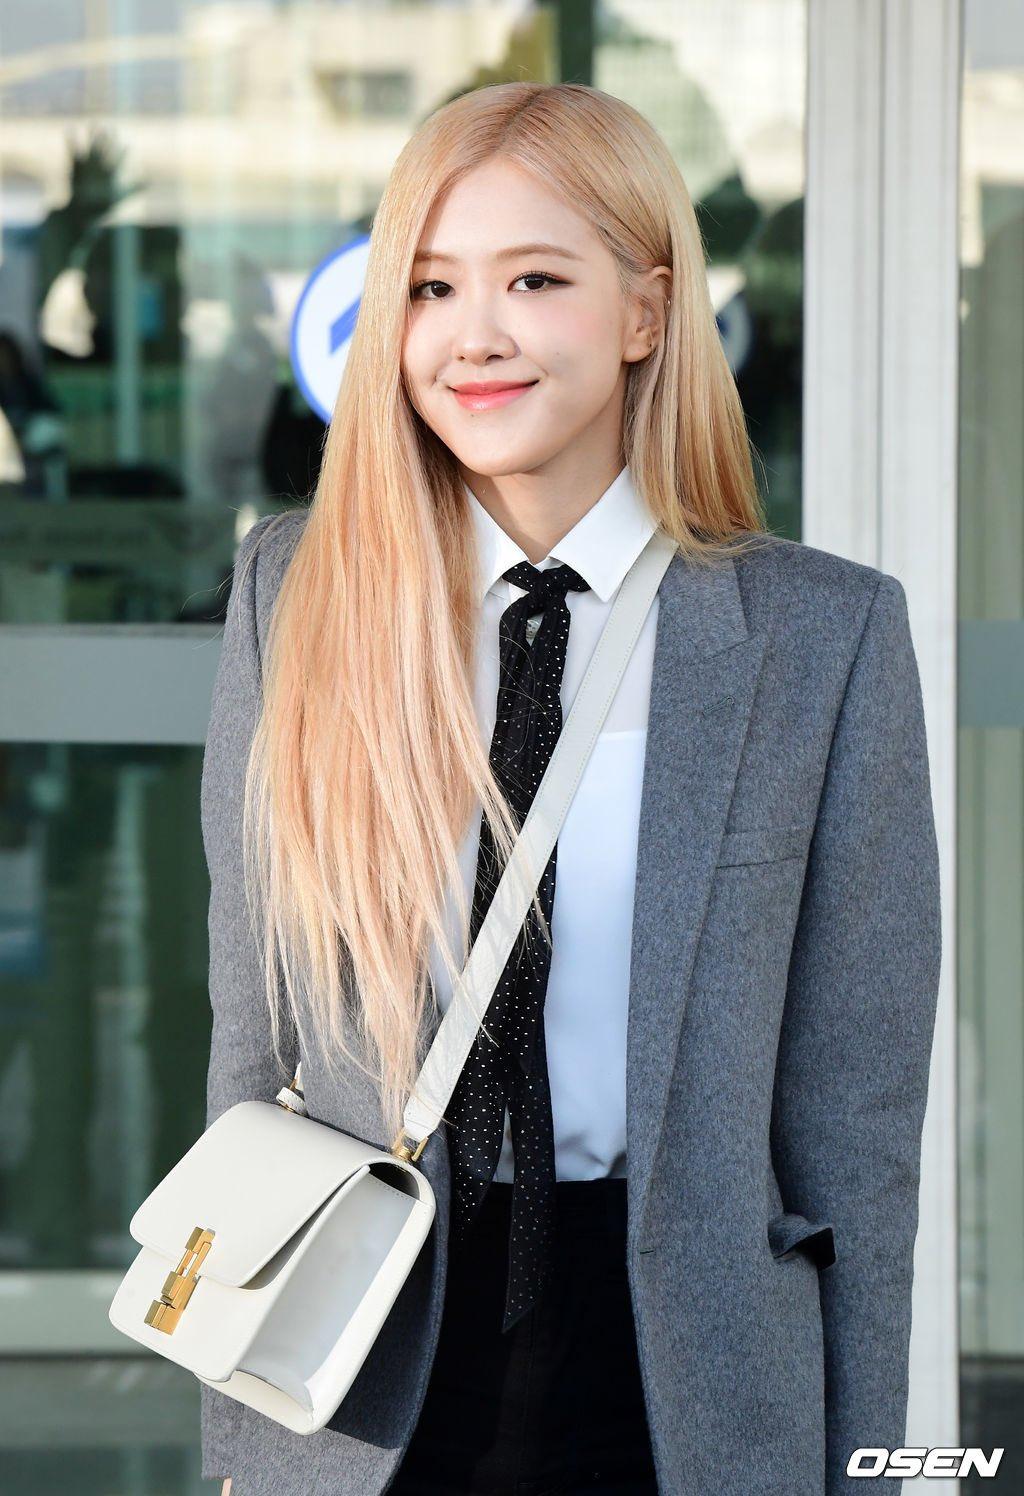 7-BLACKPINK-Rose-Airport-Outfit-blazer-to-Paris-26-January-2020